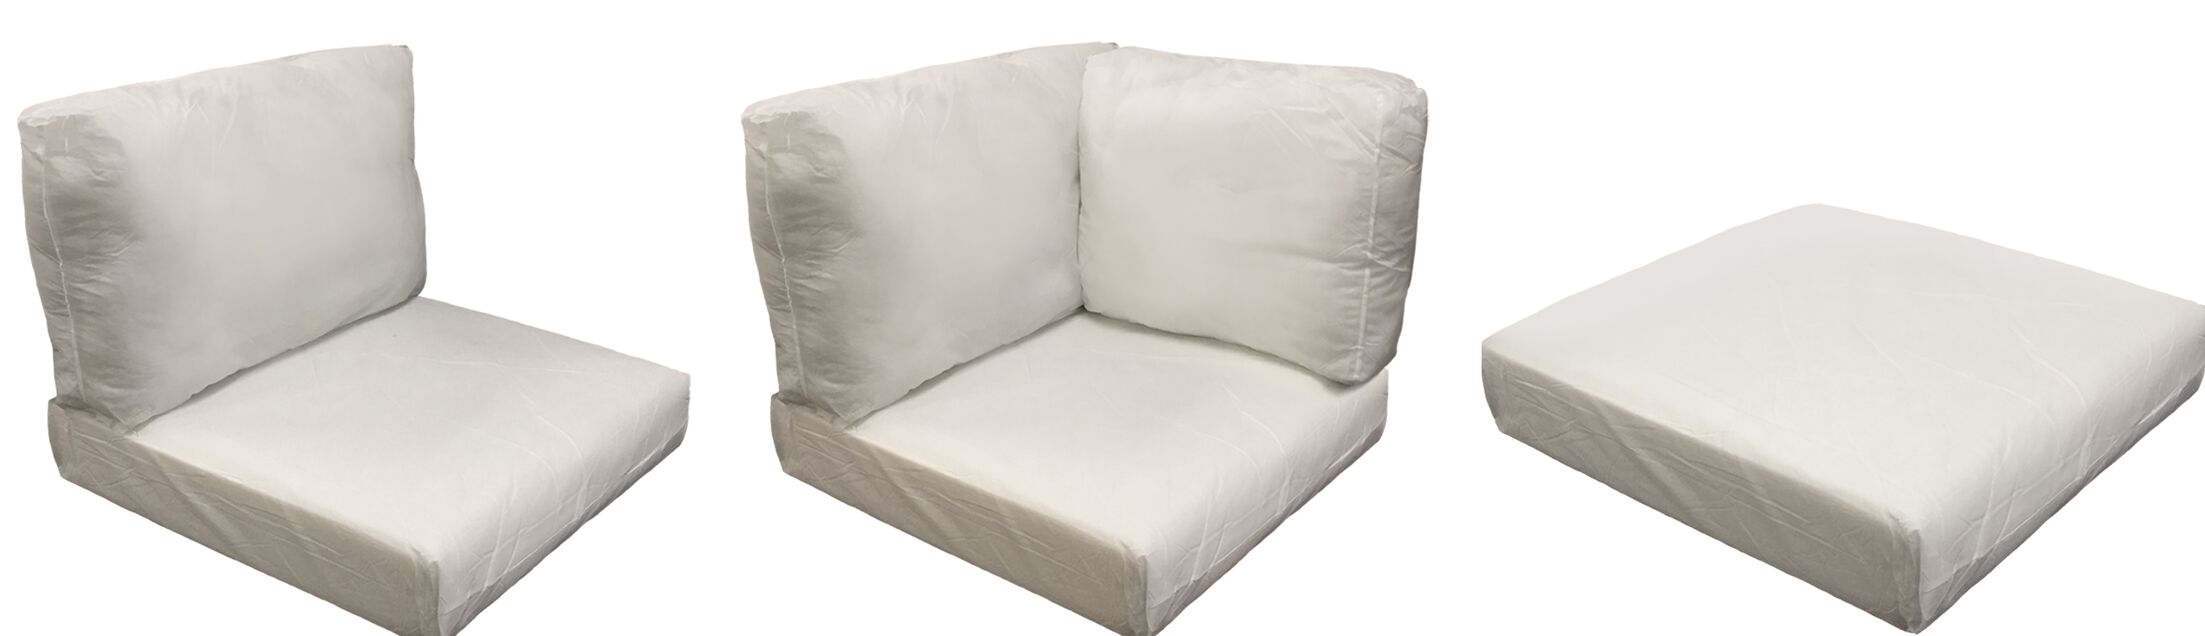 East Village Outdoor 25 Piece Lounge Chair Cushion Set